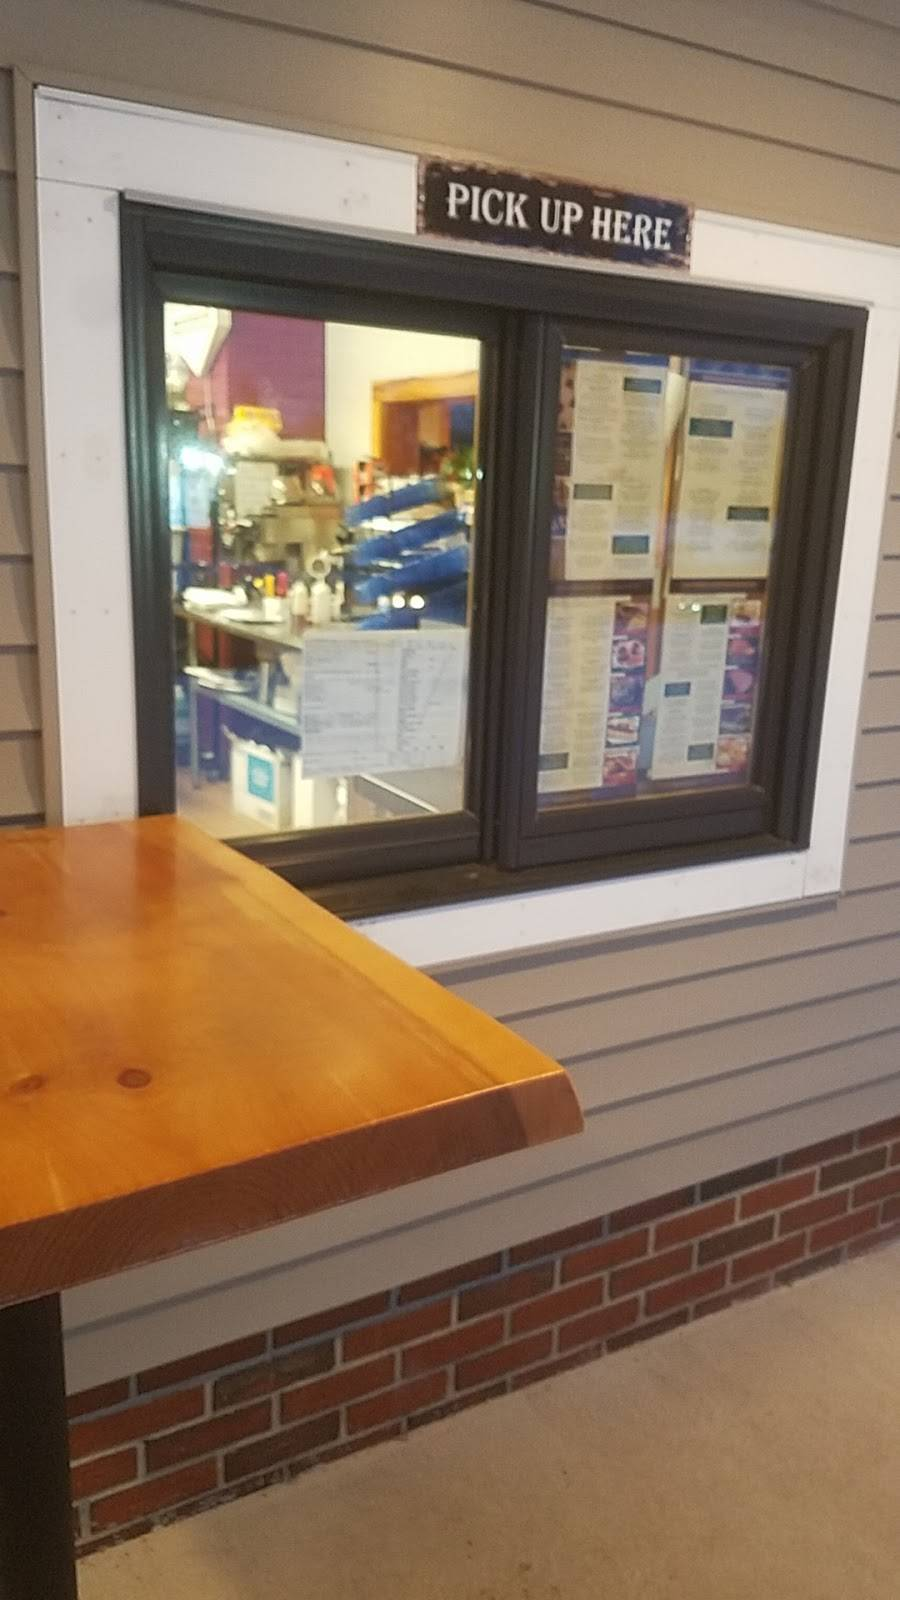 Fairgrounds Pizza And Pub | restaurant | 156 Maple St, Cornish, ME 04020, USA | 2076259253 OR +1 207-625-9253